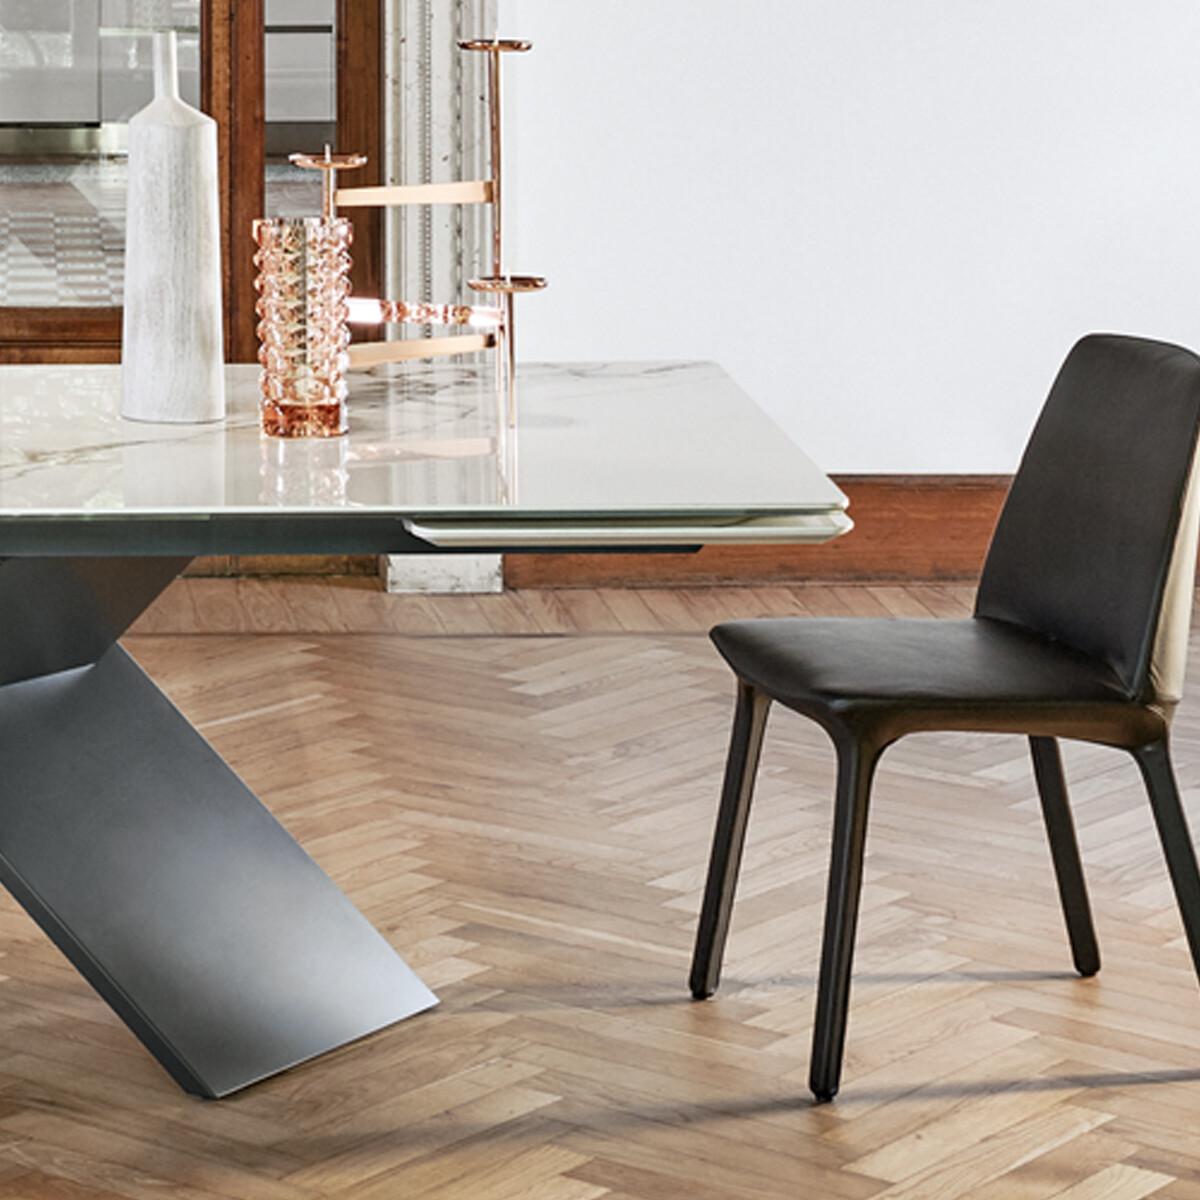 bonaldo ax ausziehbarer esstisch 160 240 cm keramikplatte casa de. Black Bedroom Furniture Sets. Home Design Ideas